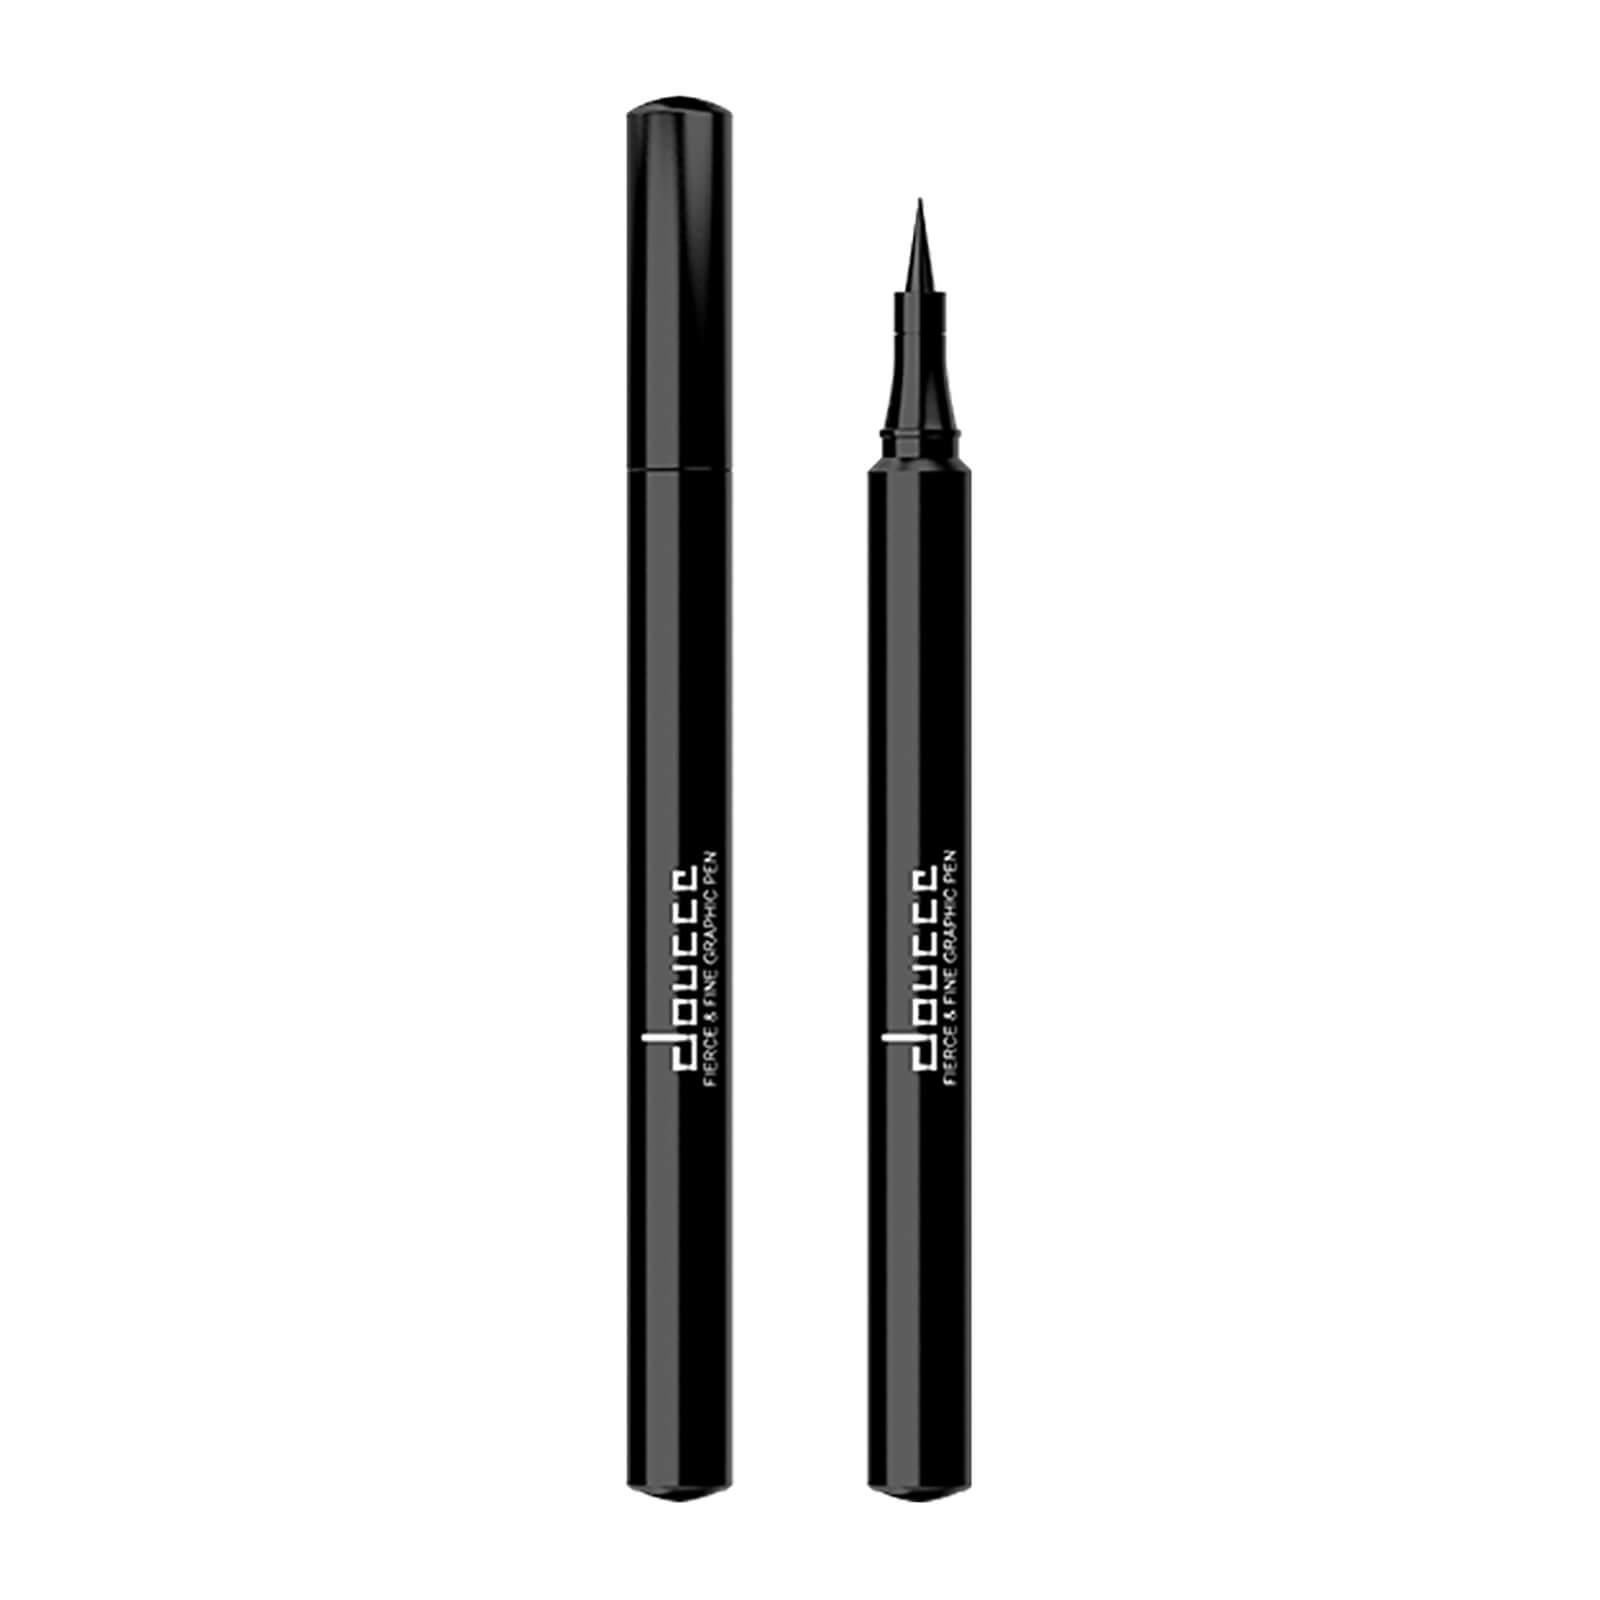 Delineador de Olhos Fierce and Fine - Black da doucce 1,1 g